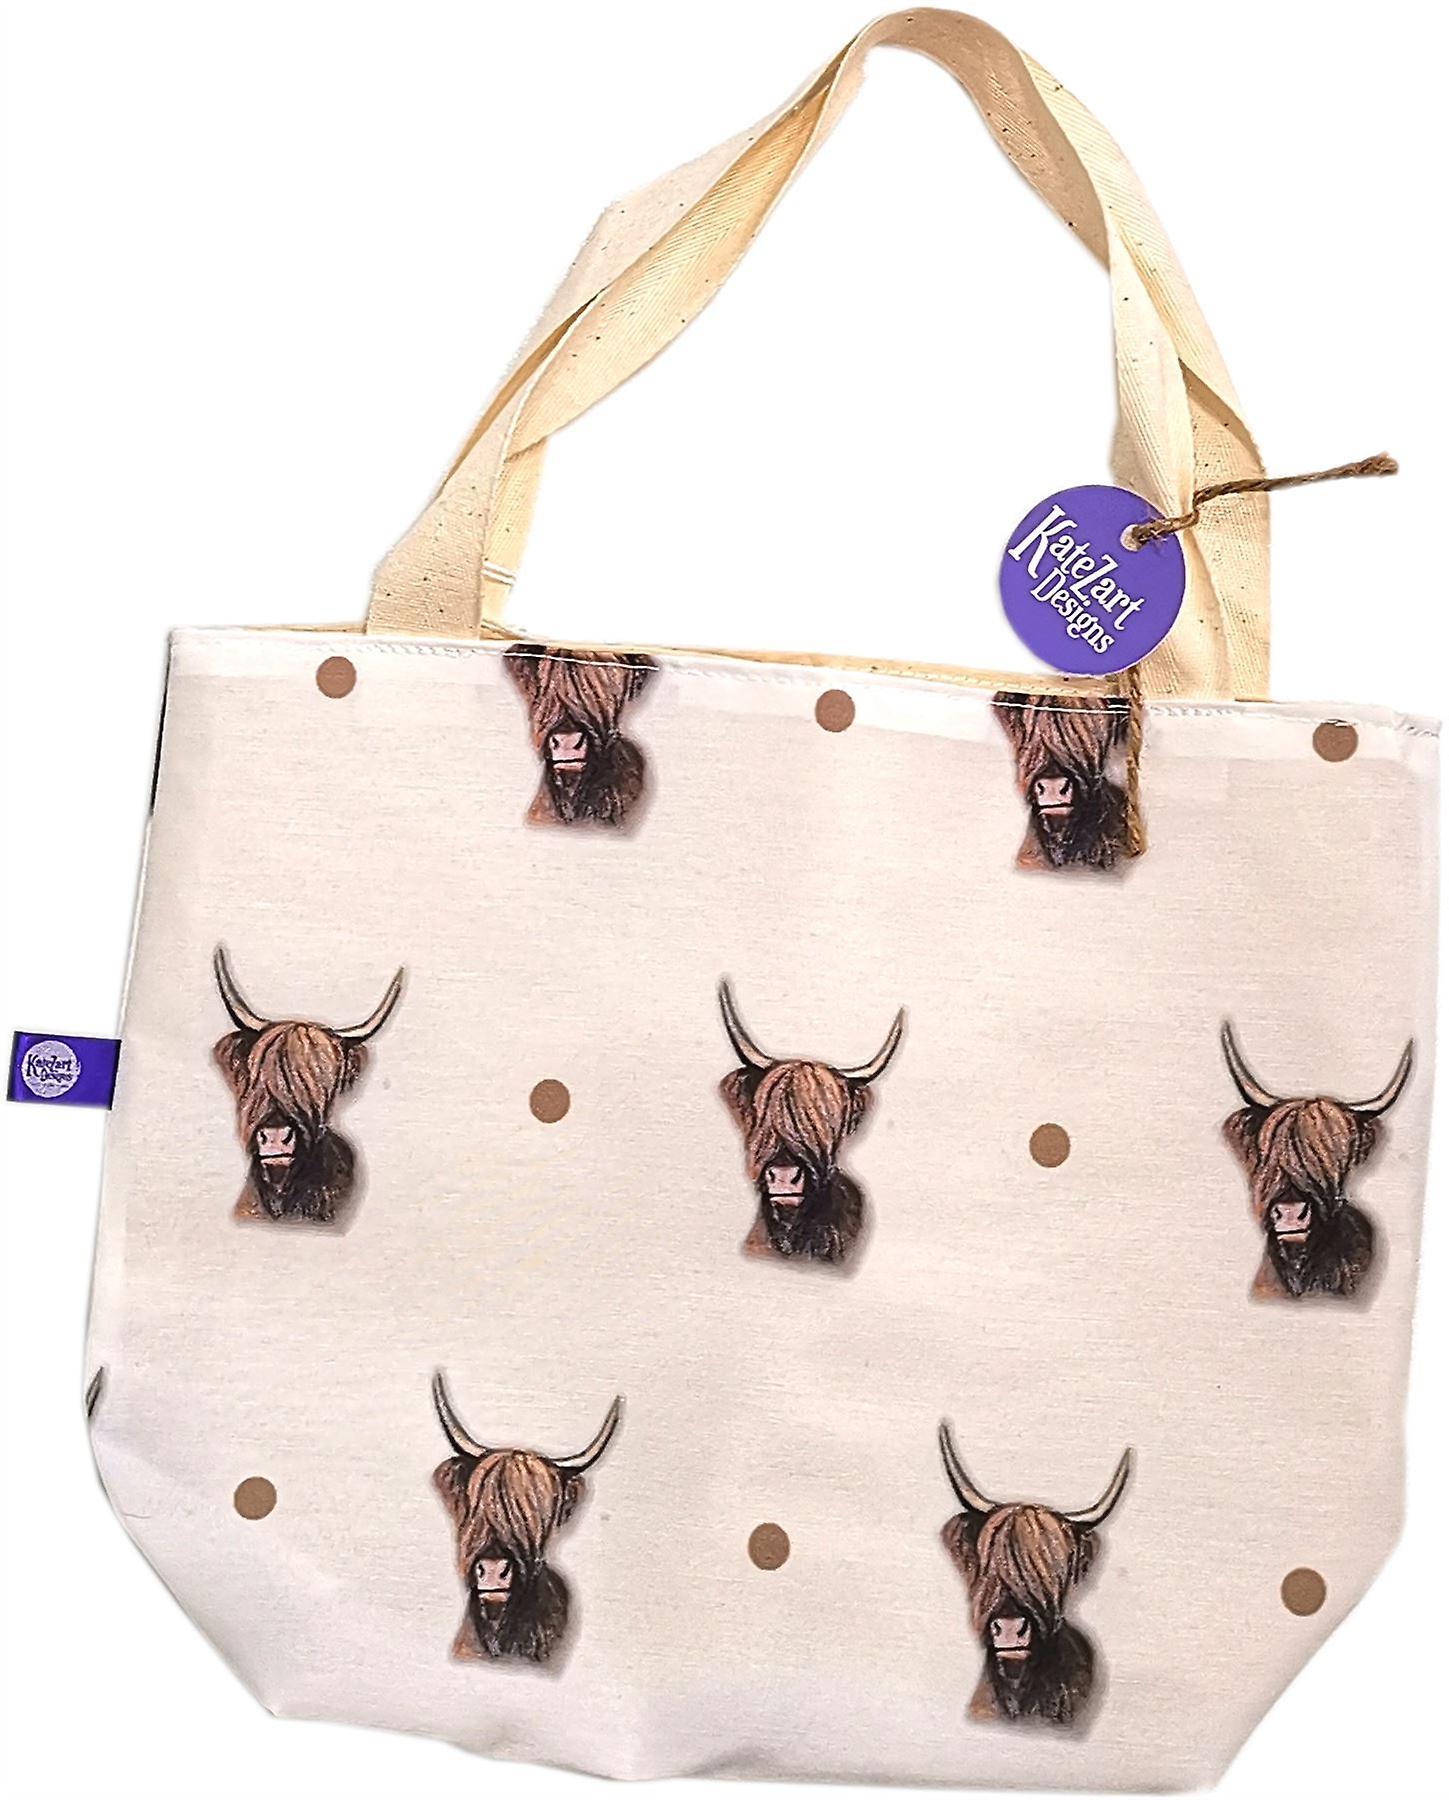 KateZart Designs Highland Cow Tote Bag